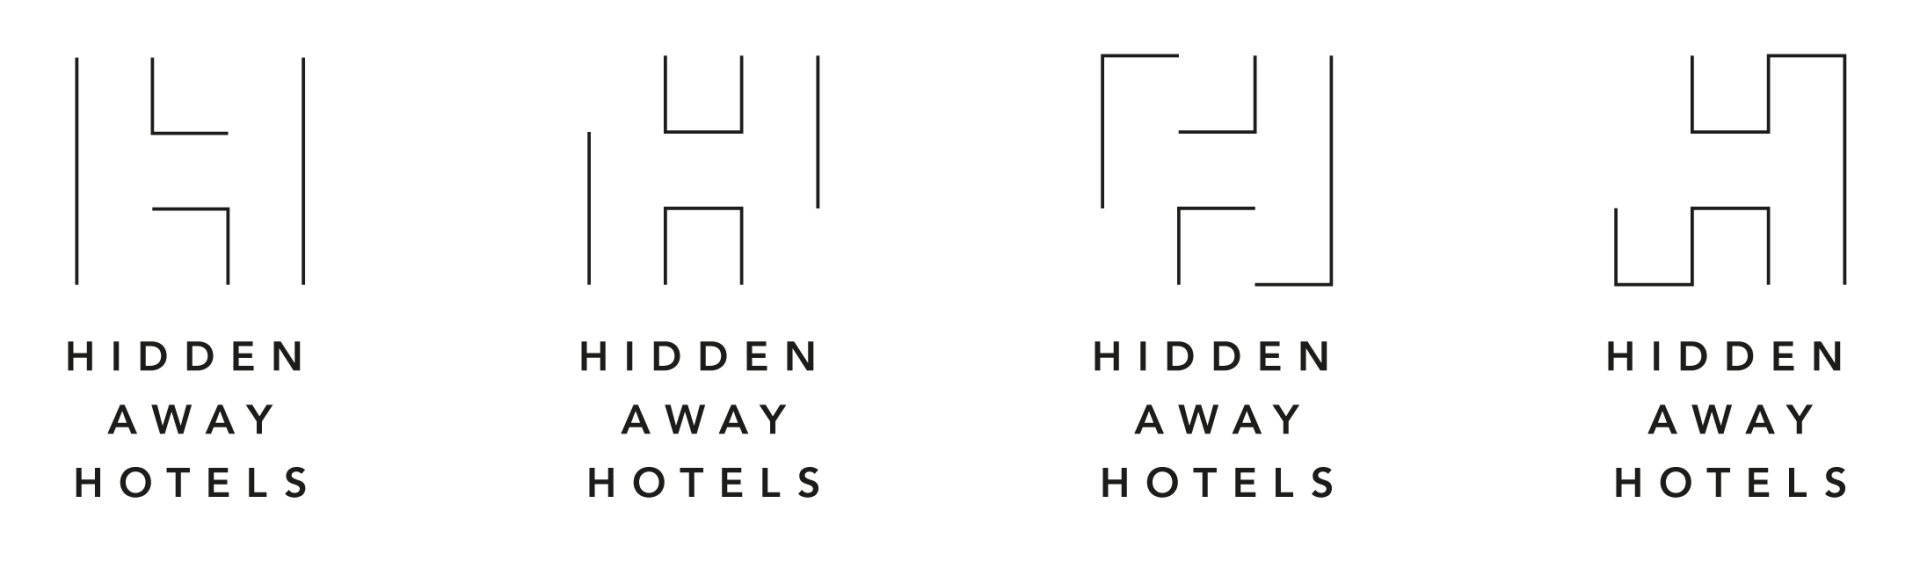 brand-hidden-away-hotels-imagen-corporativa-thankium-agencia-publicidad